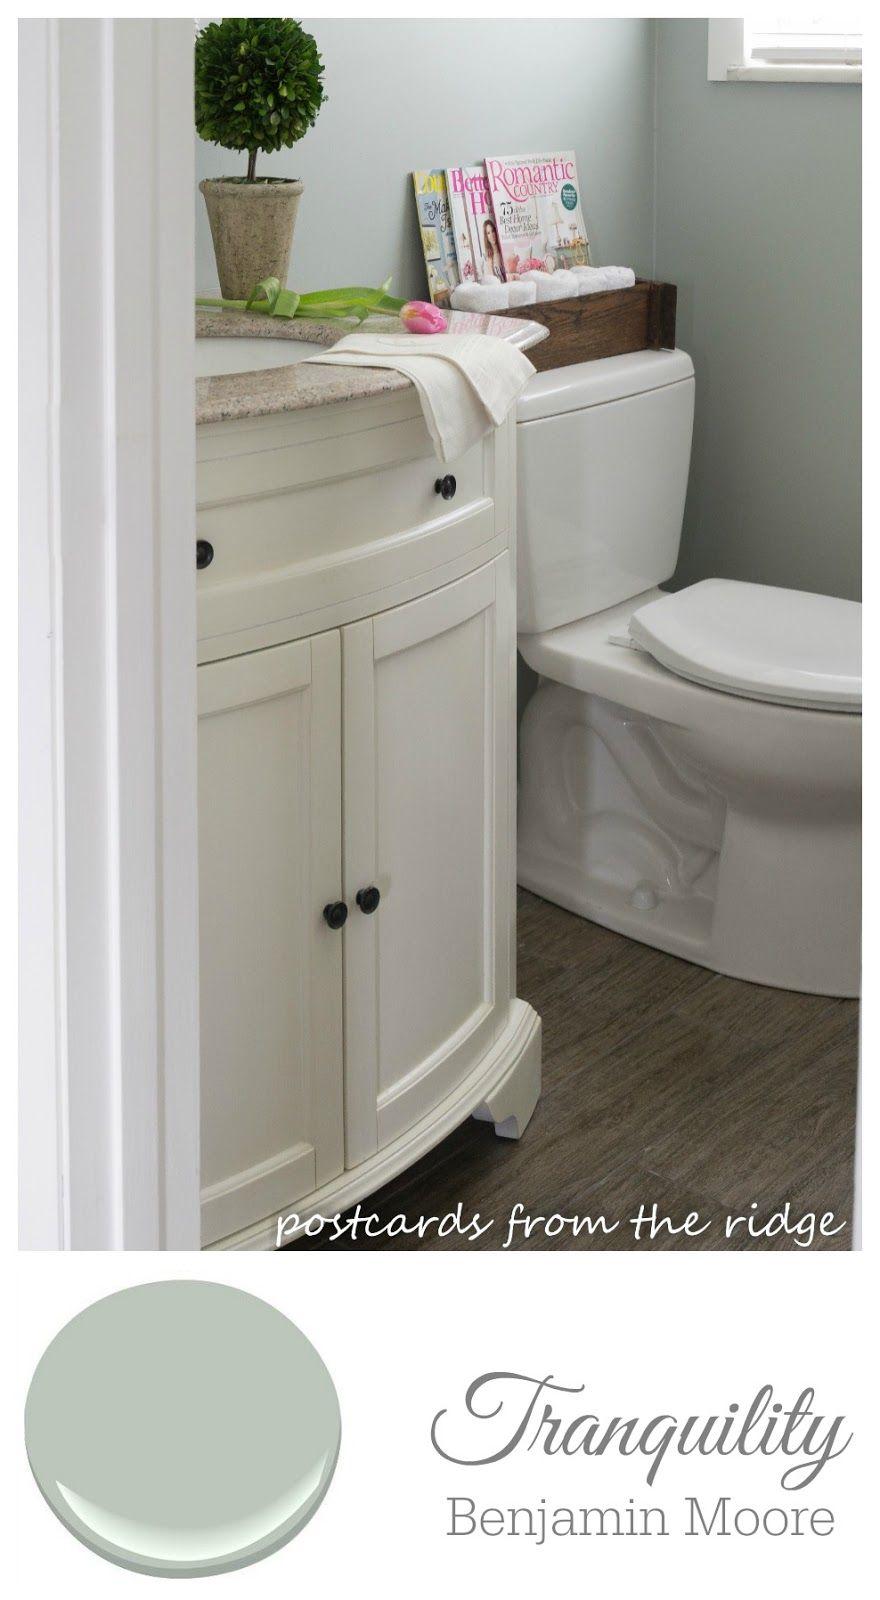 Benjamin moore colors for bathroom - Benjamin Moore Tranquility